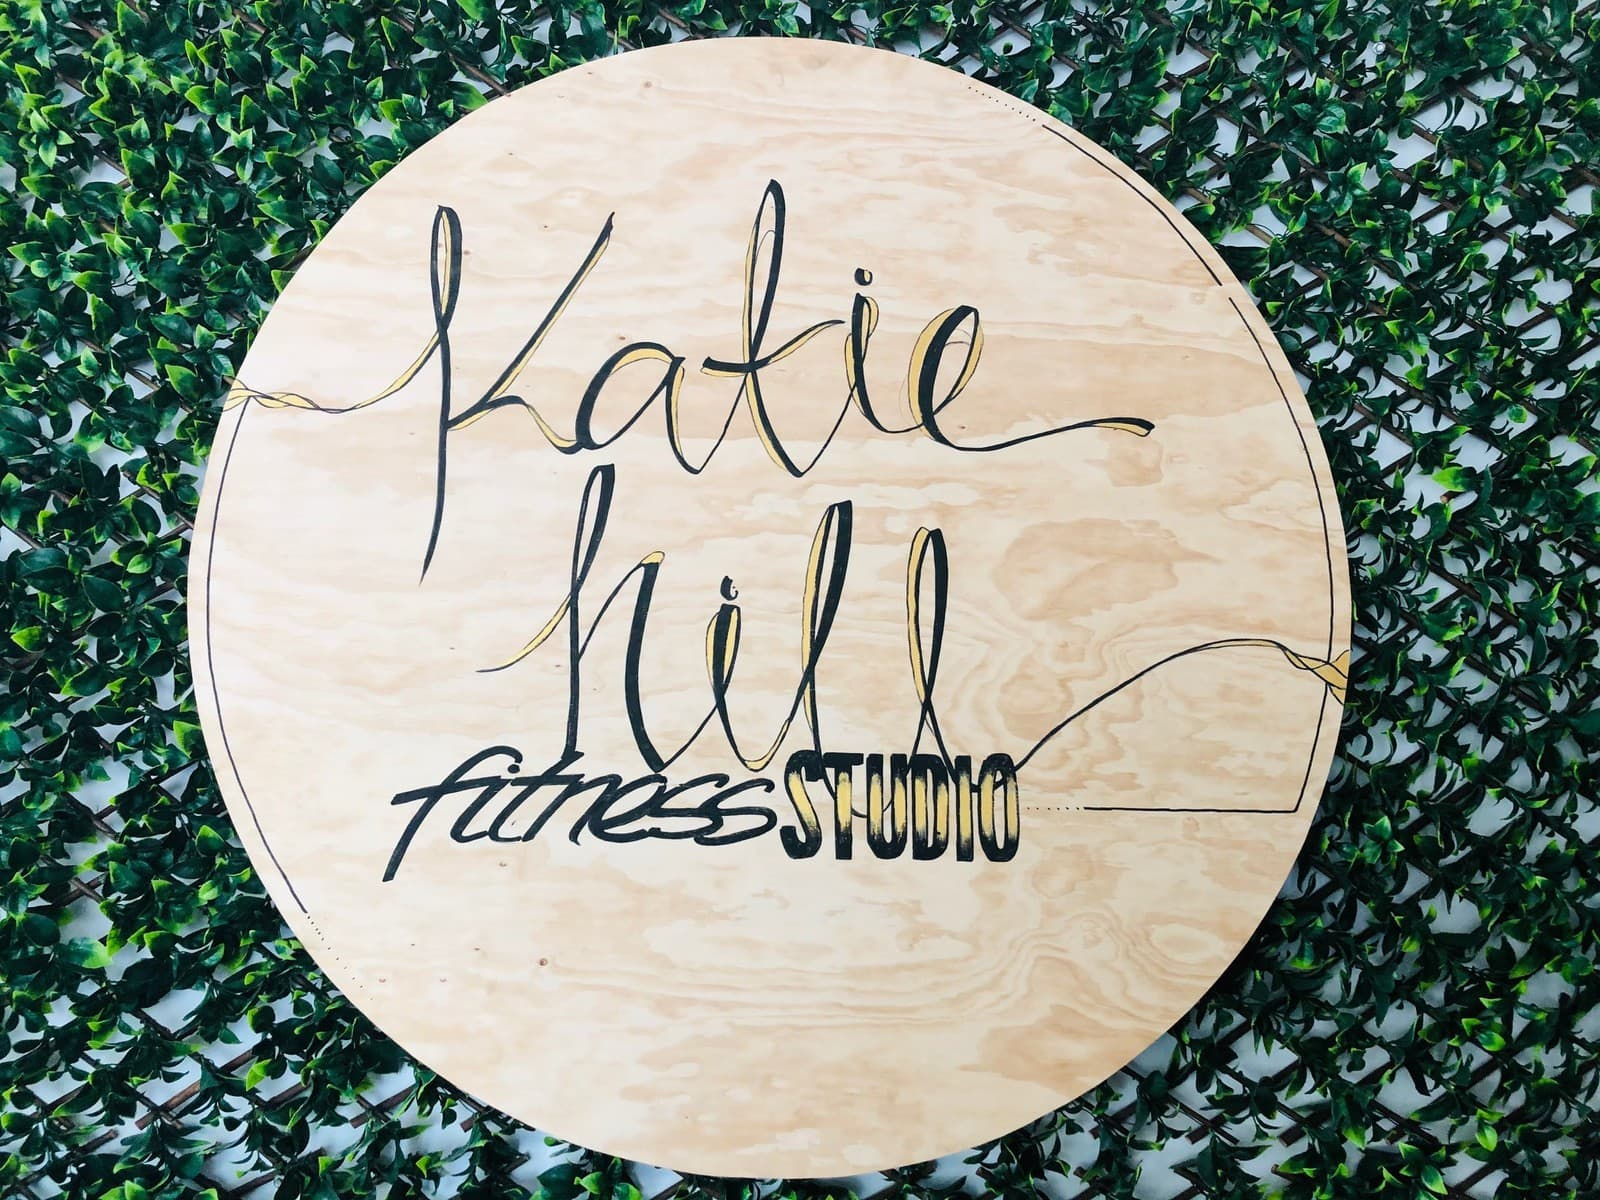 katie hill fitness